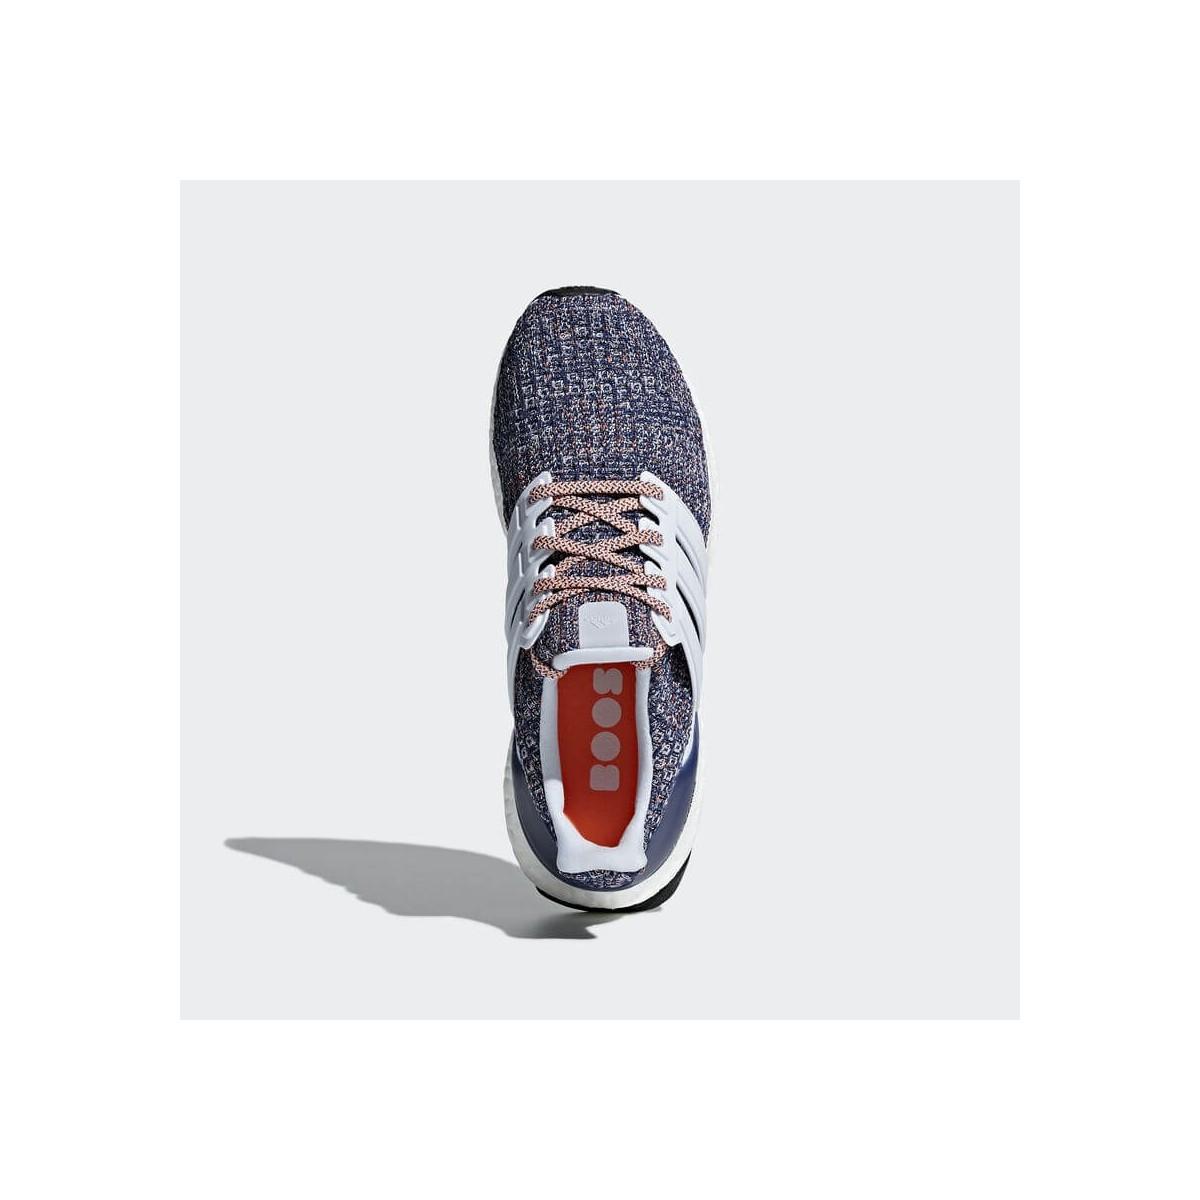 Zapatillas Adidas Ultra Boost 4.0 Mujer Multicolor PV18 93fc84271bbb5